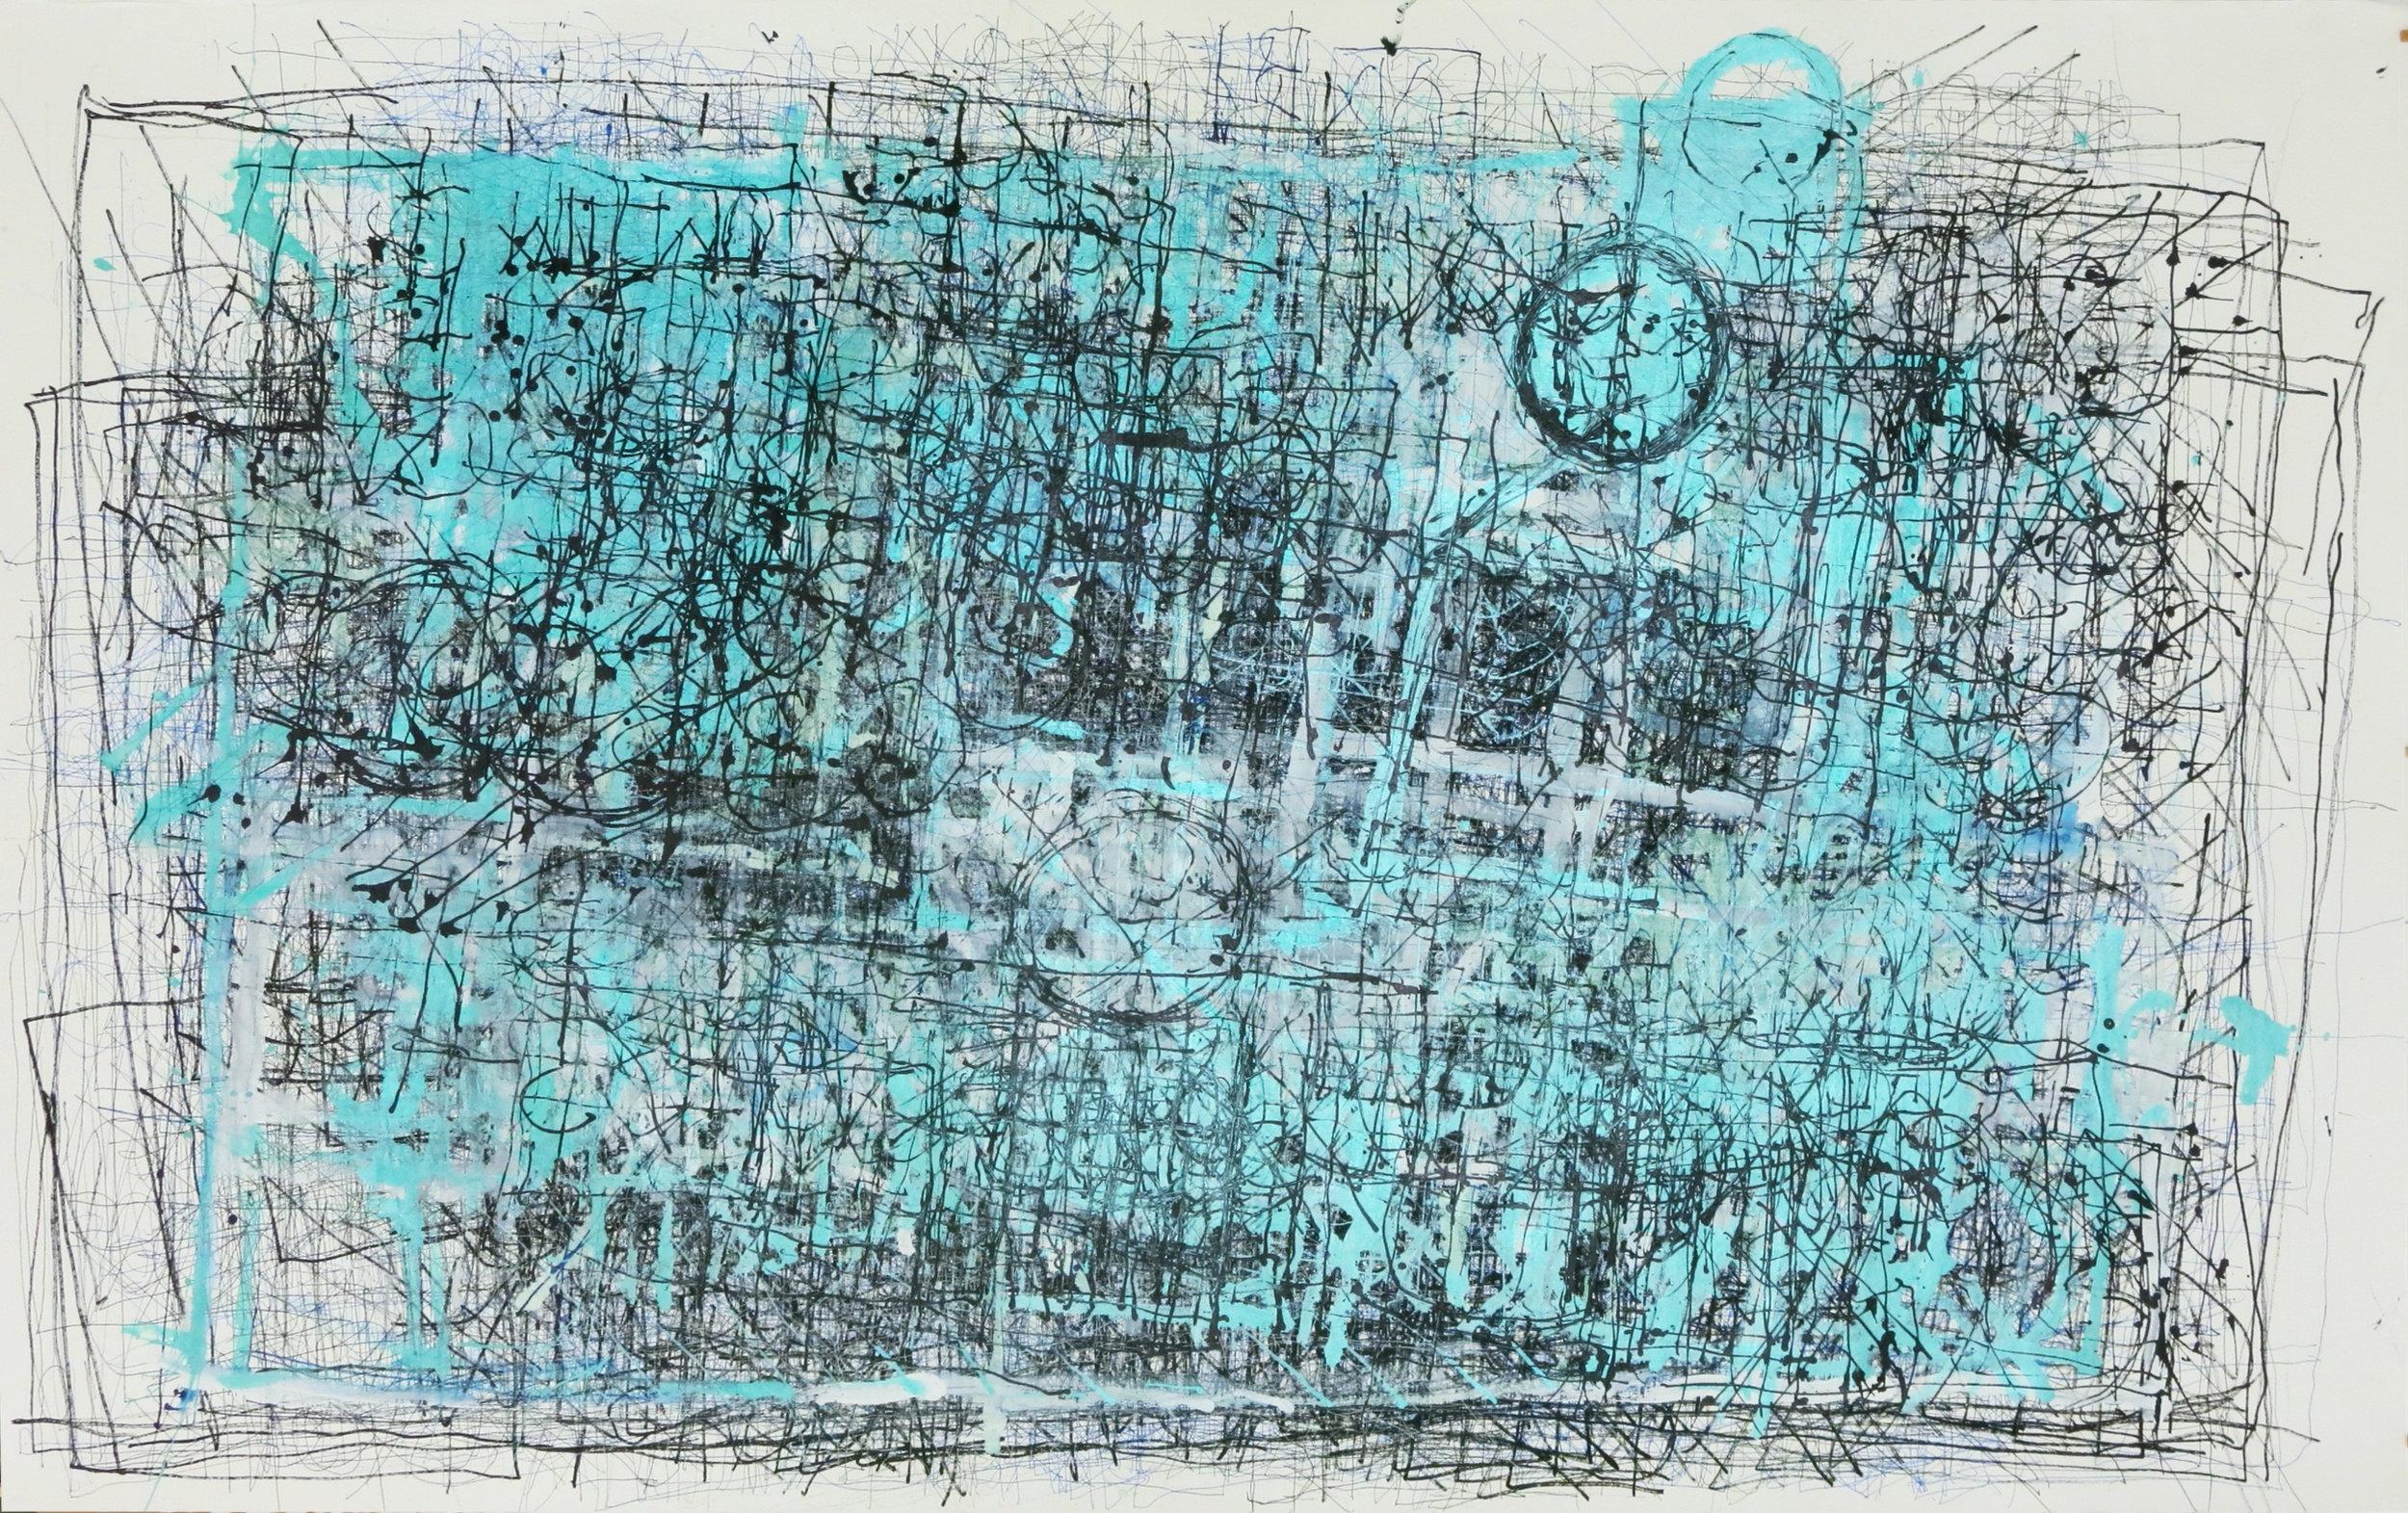 Dan Miller, Untitled (DM 254), 2016, 52 x 85 inches